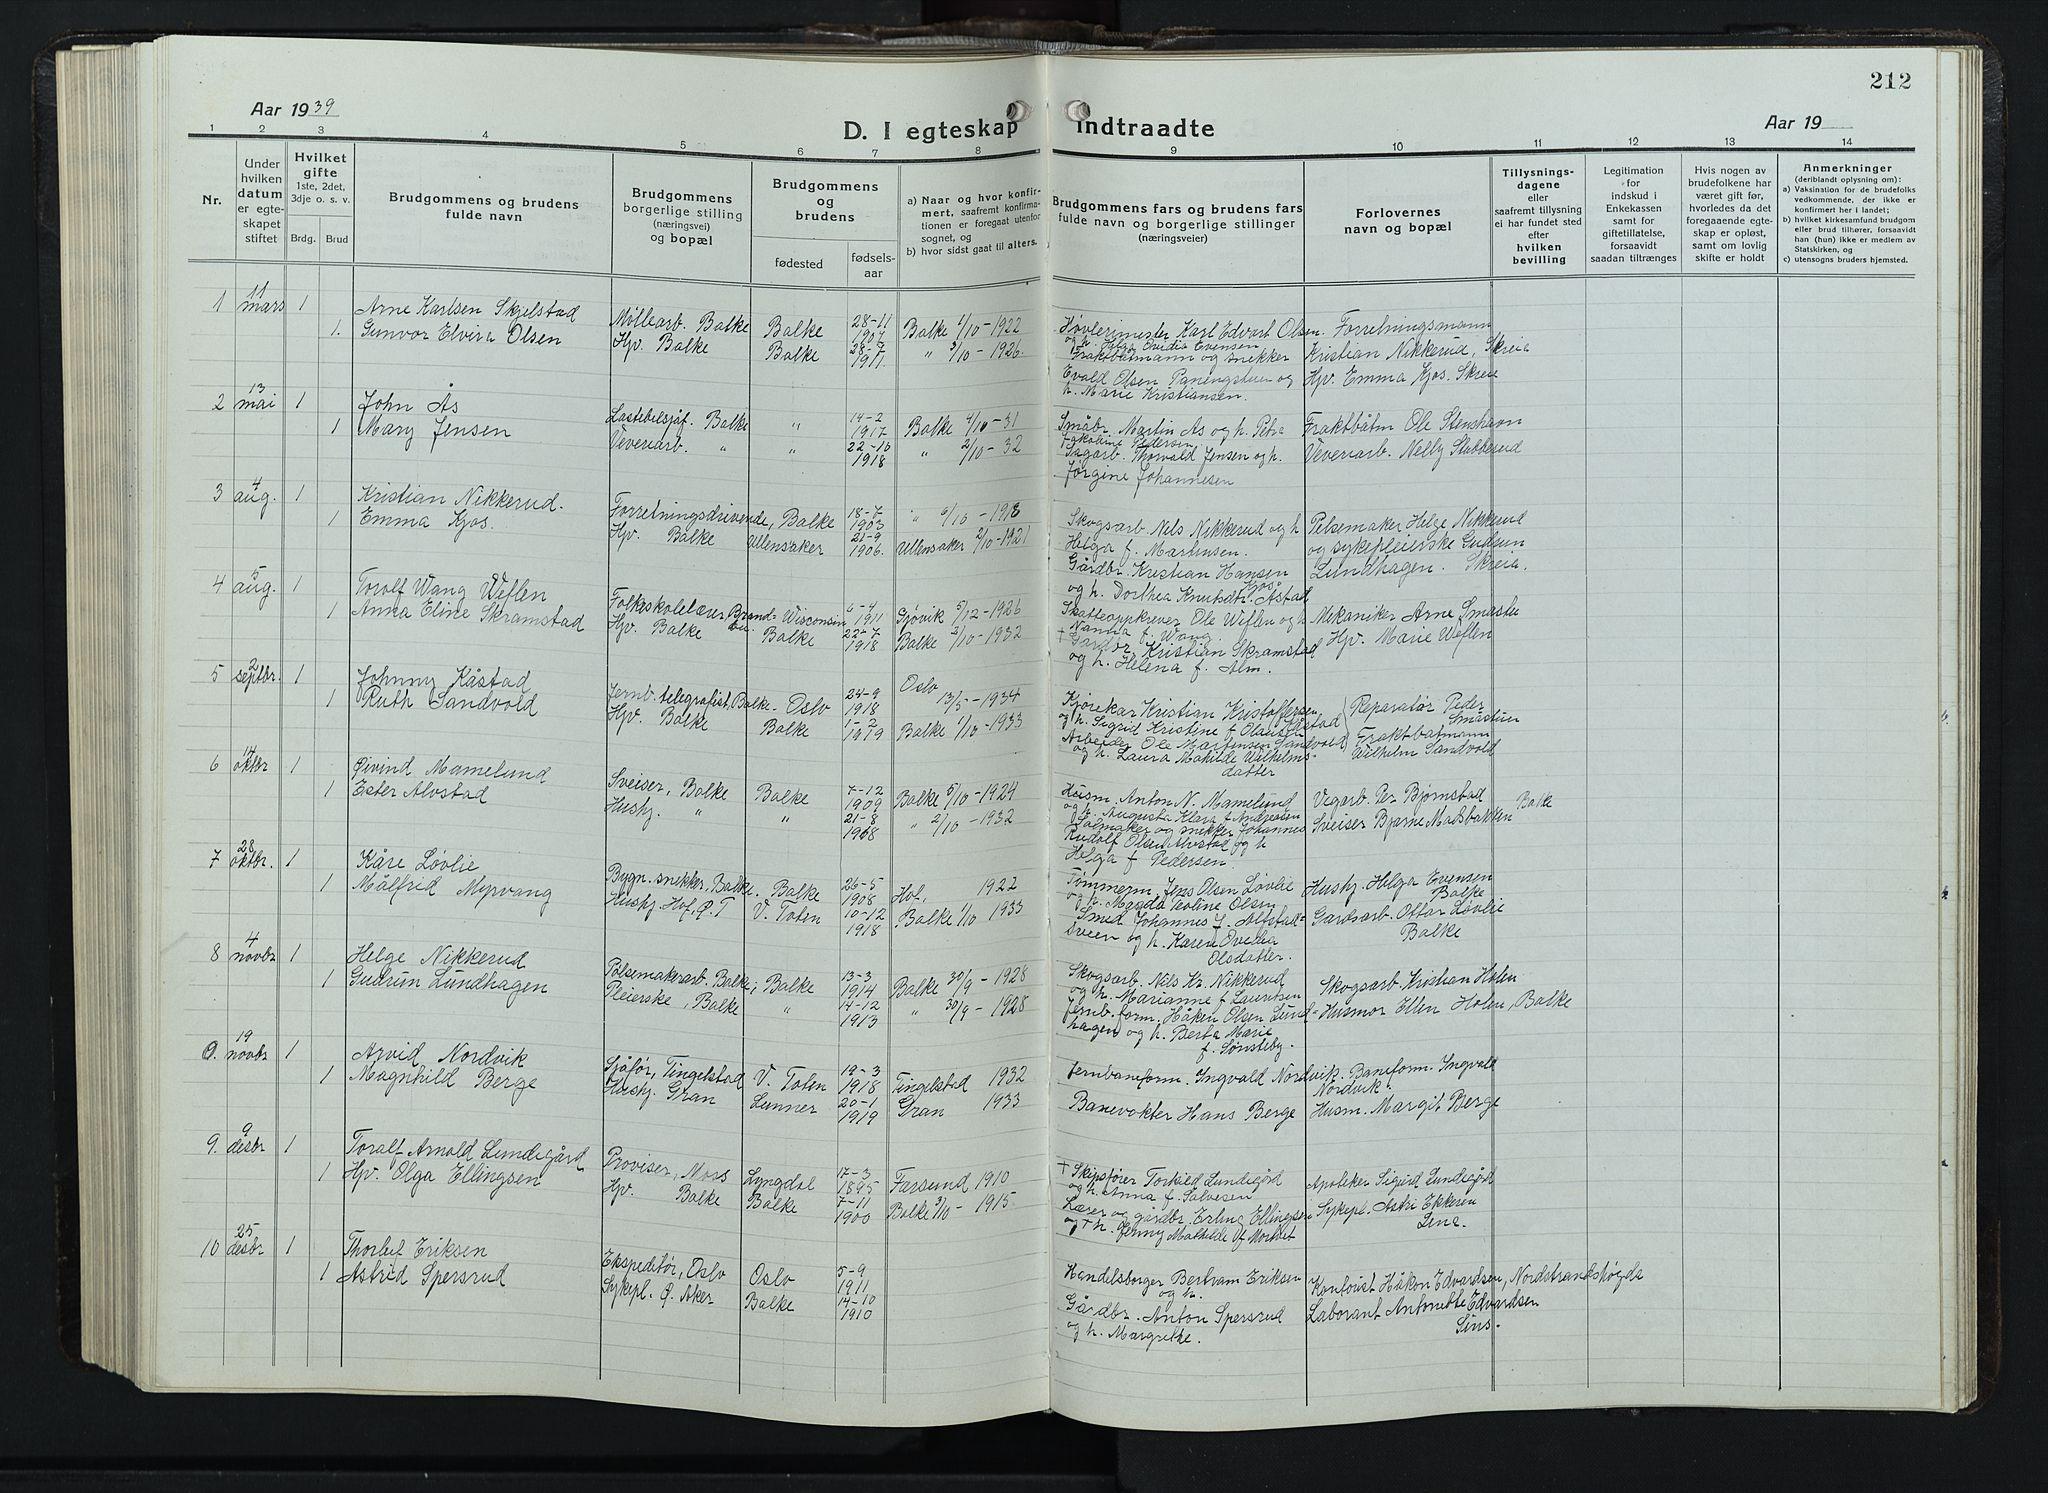 SAH, Balke prestekontor, Klokkerbok nr. 1, 1920-1955, s. 212